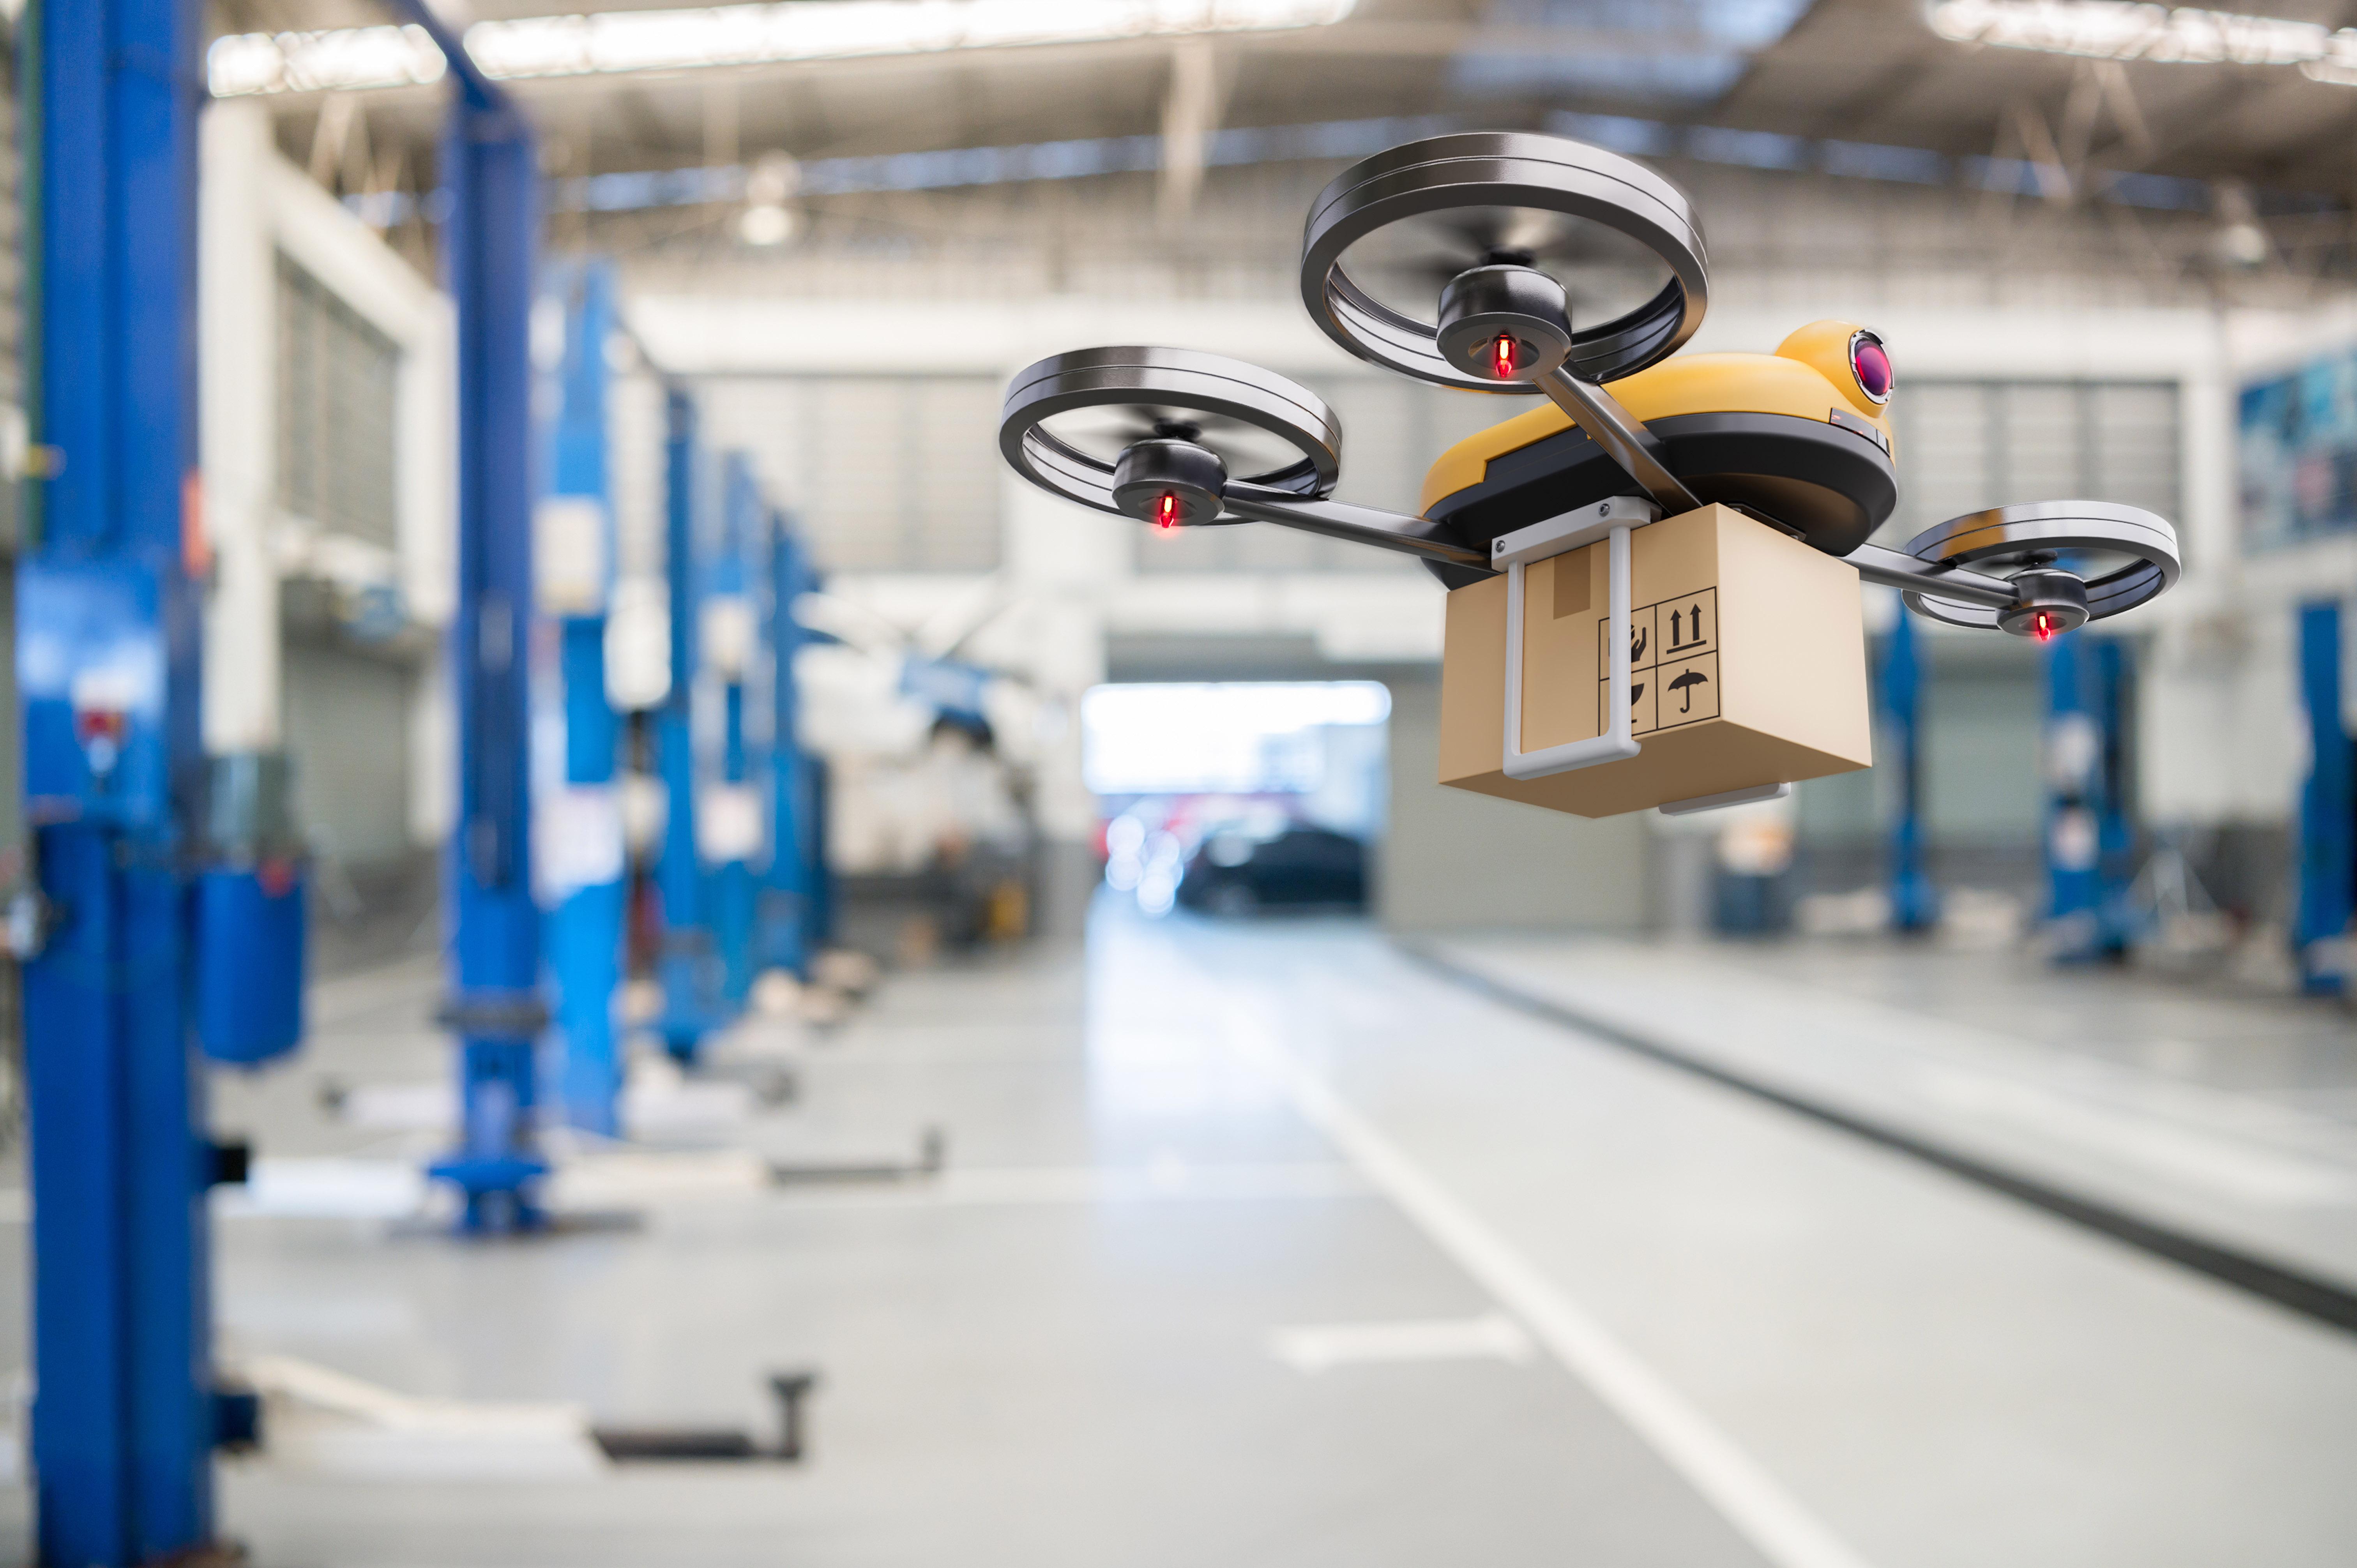 UPS drone delivery program